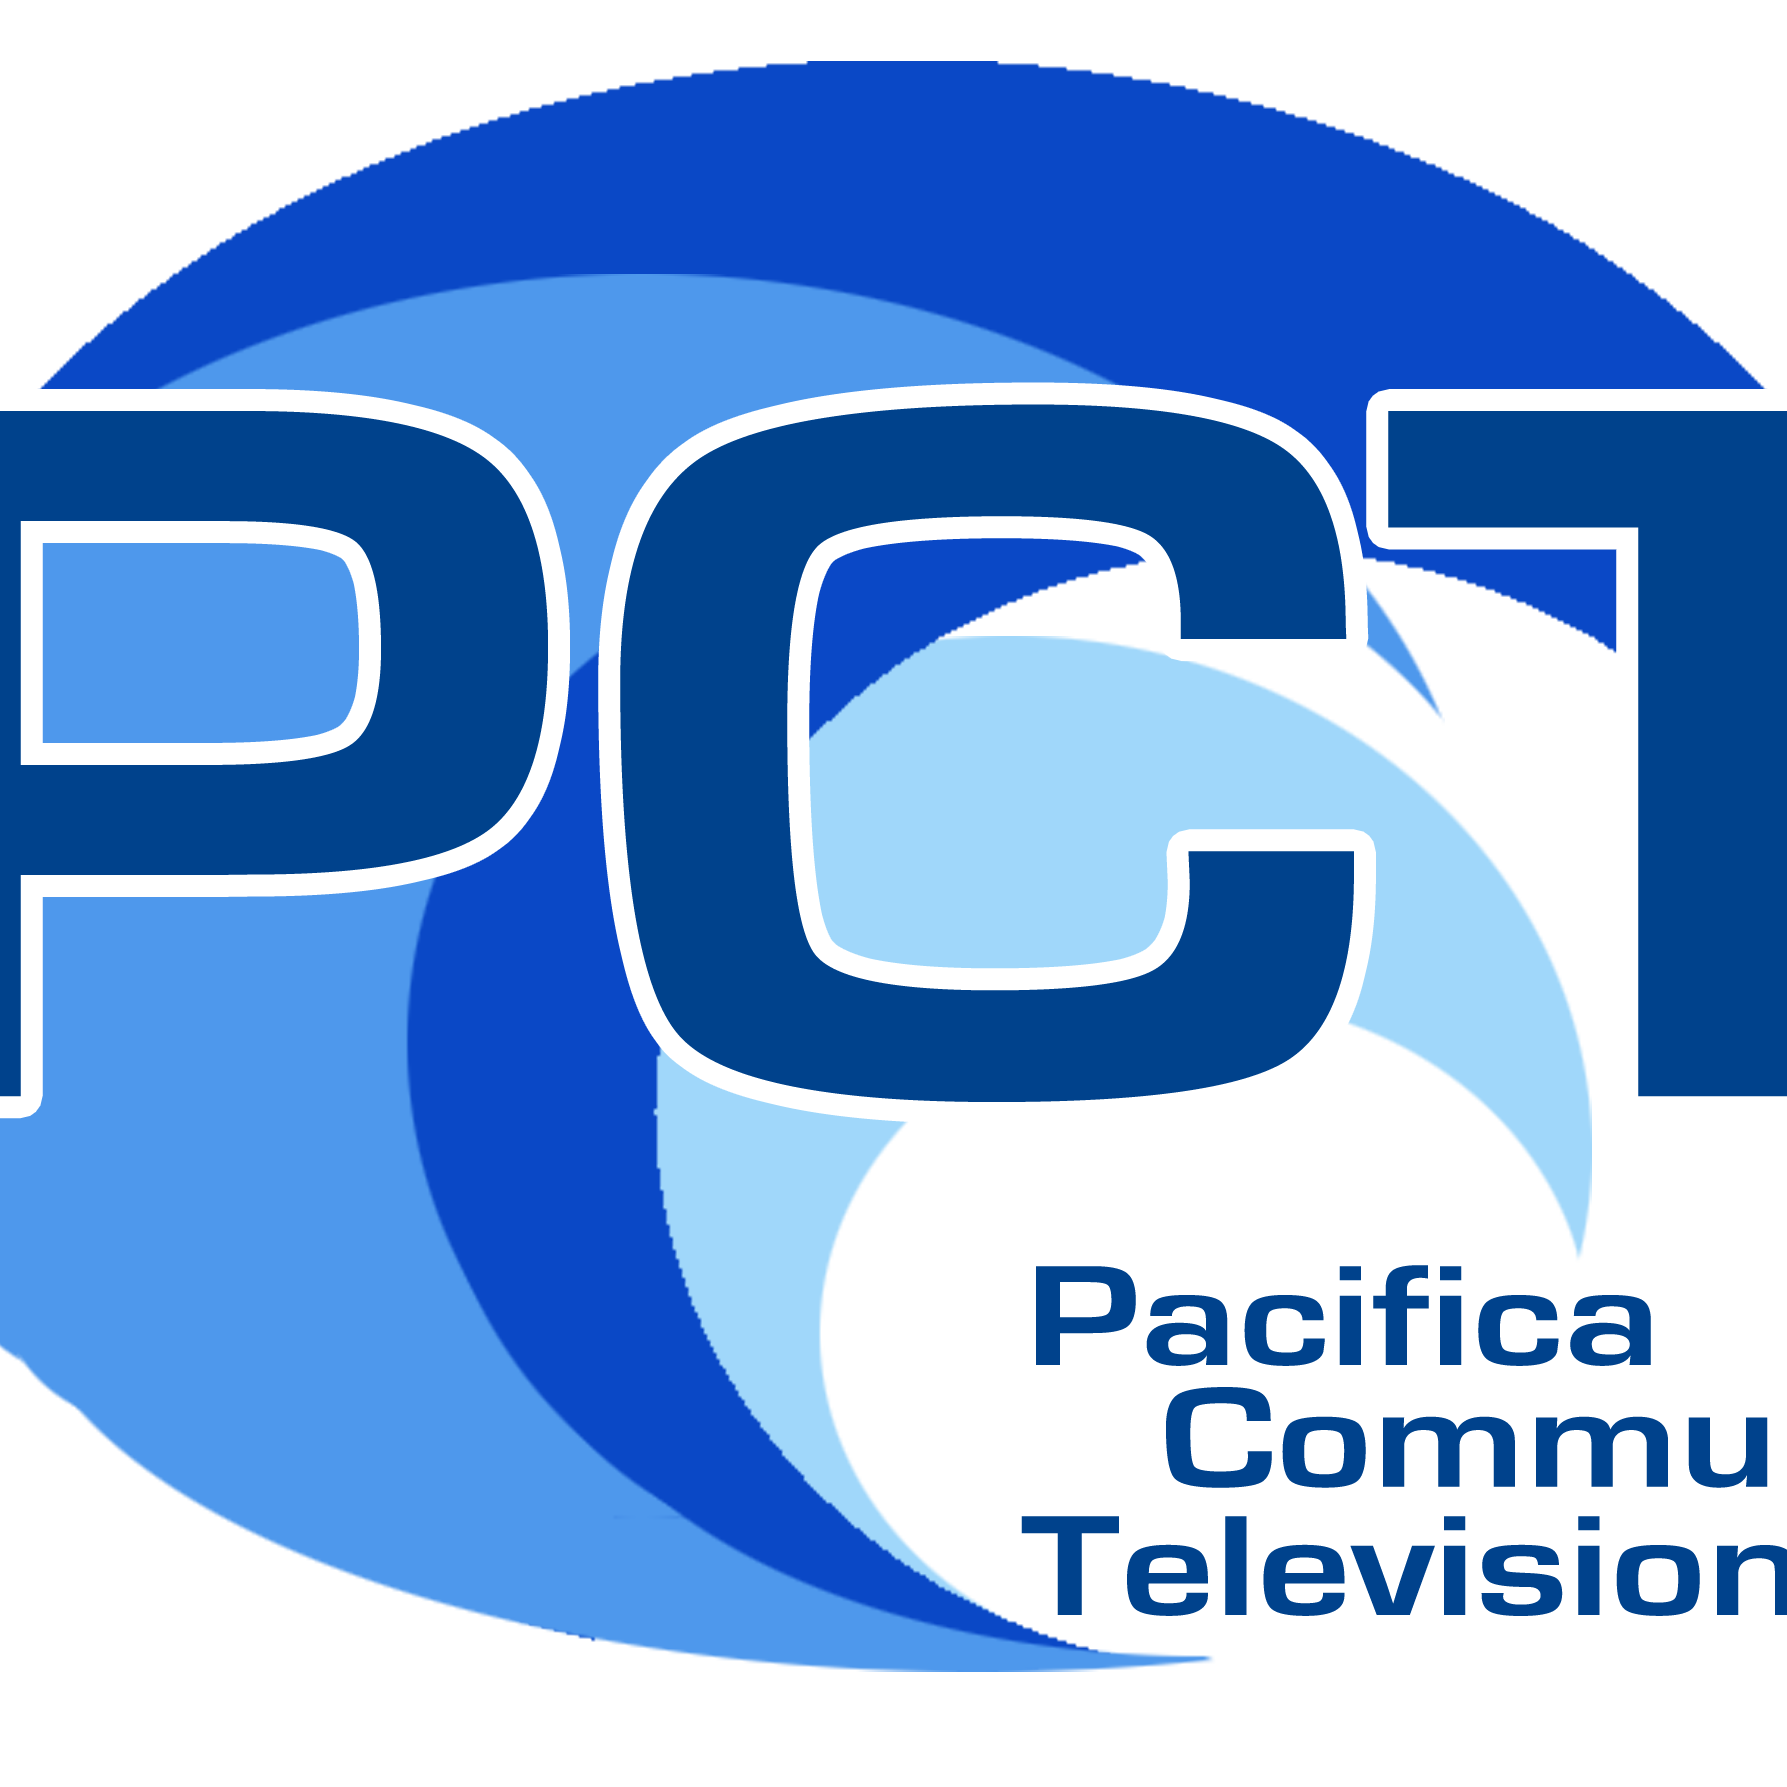 Pacific Coast Television